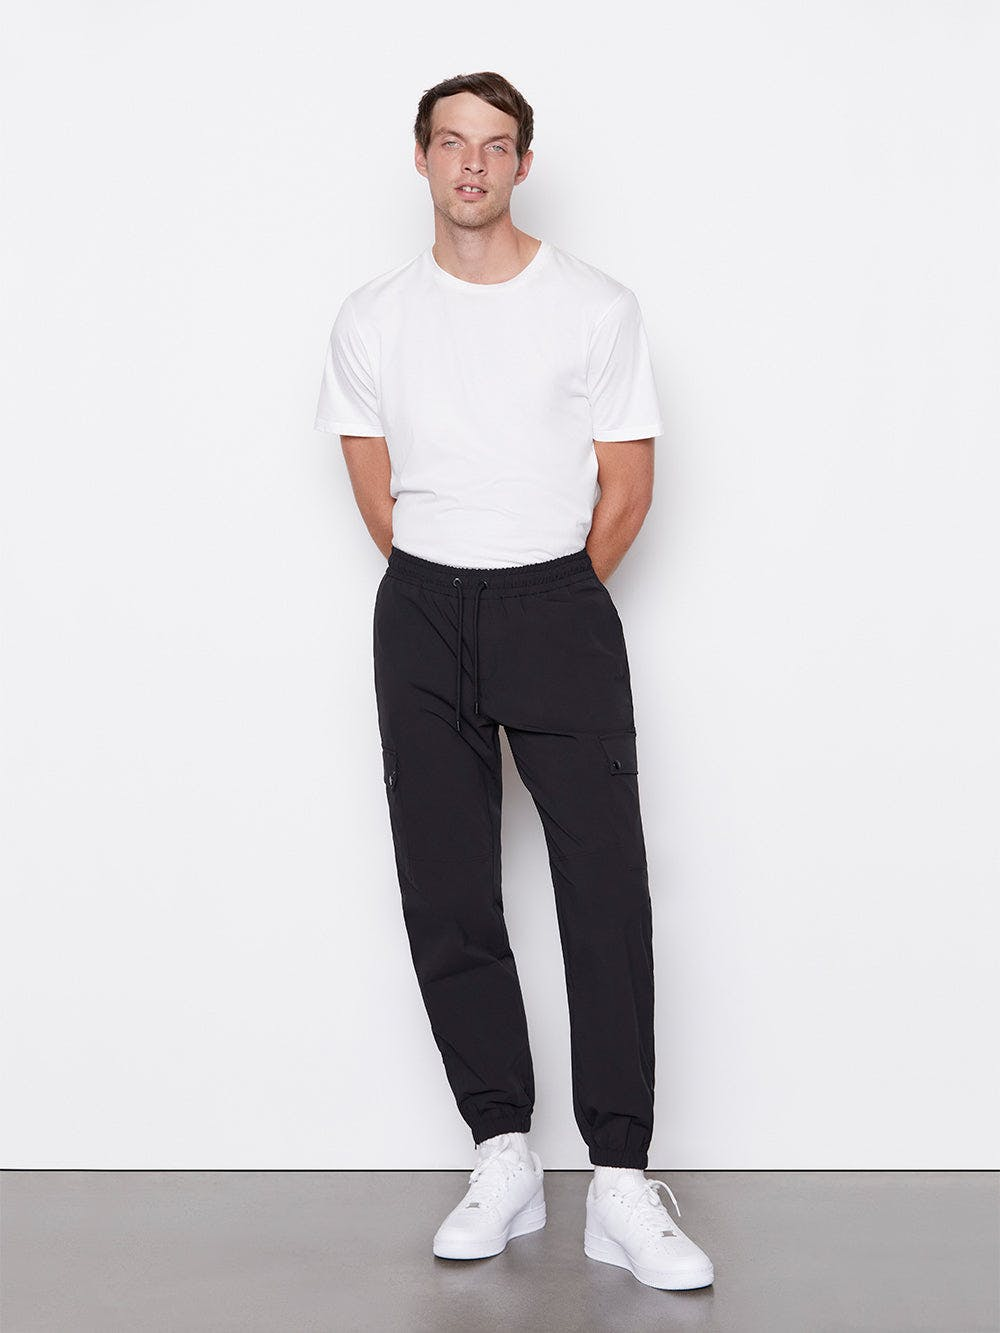 pants full body view